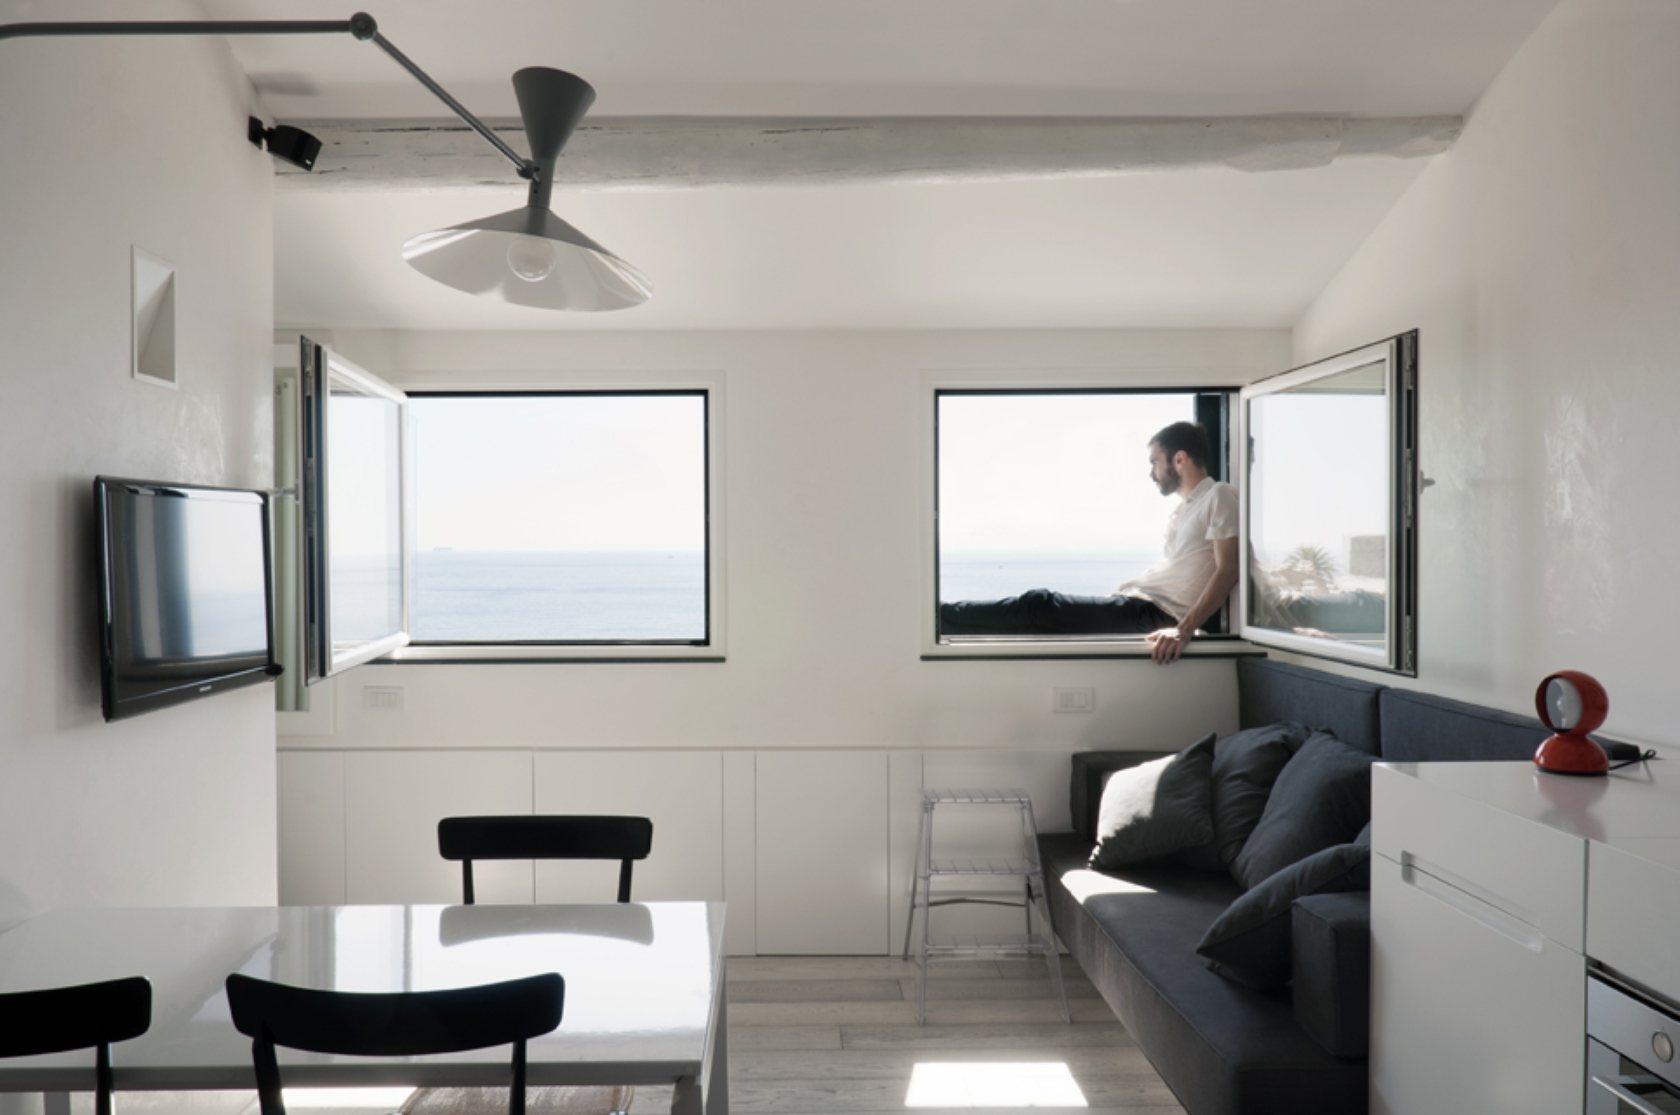 Cari-Kati-Cenevre-1-Small-apartment